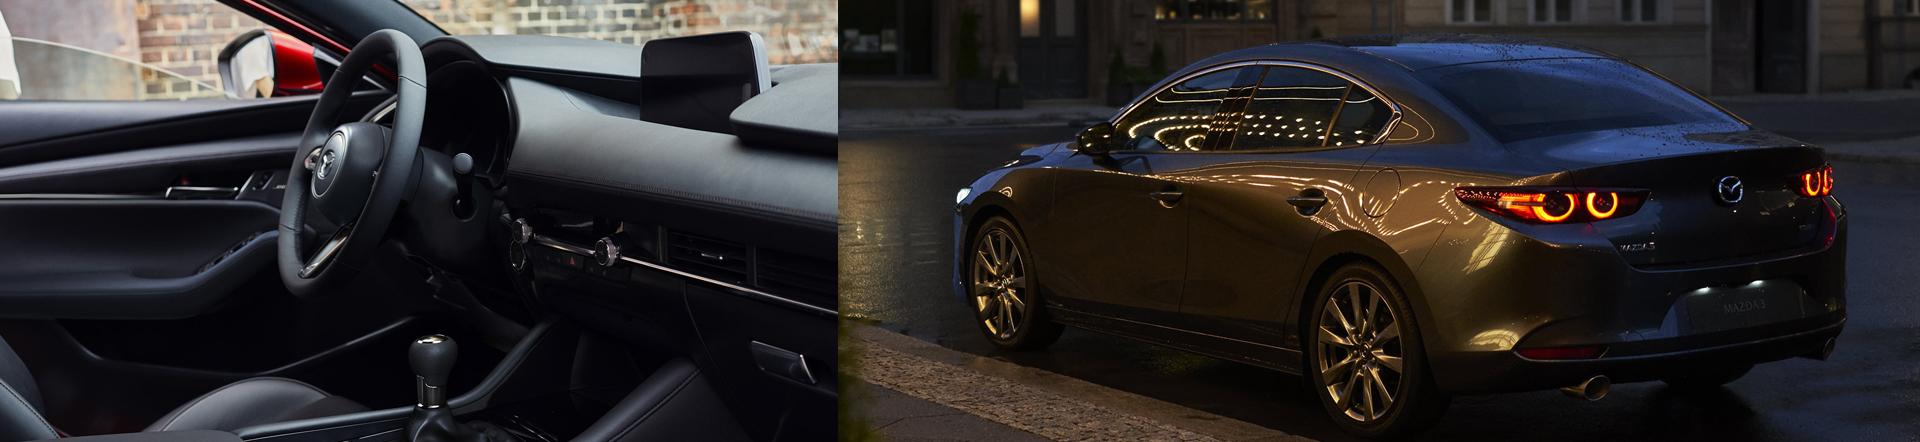 Mazda3 Sedan Headerbild